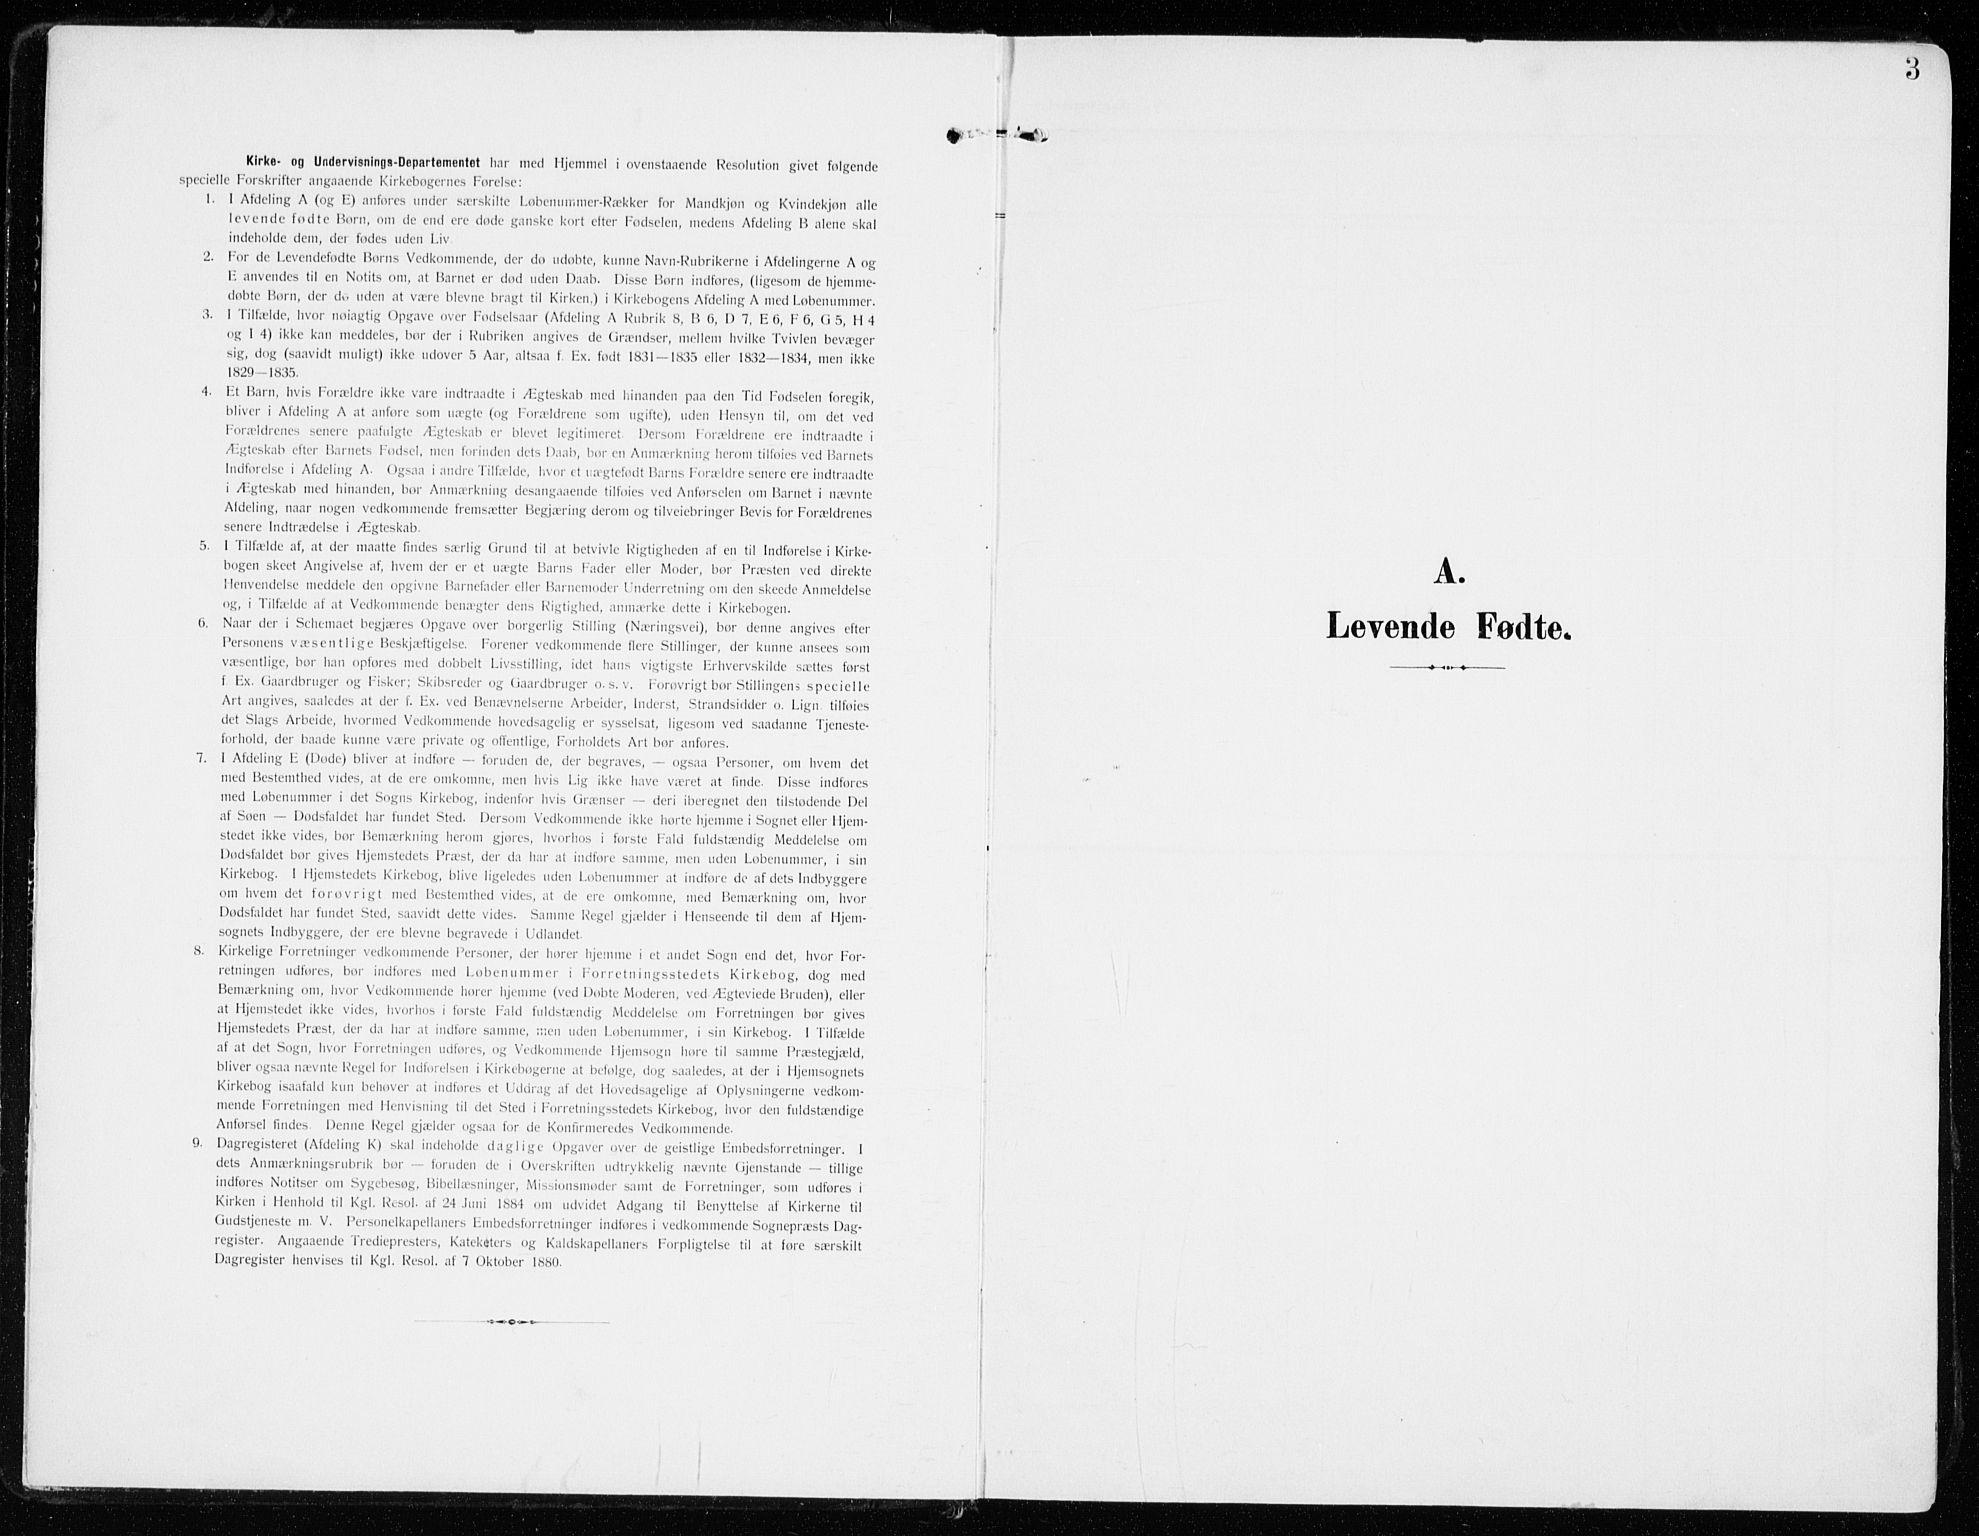 SAH, Sel prestekontor, Ministerialbok nr. 2, 1905-1919, s. 3